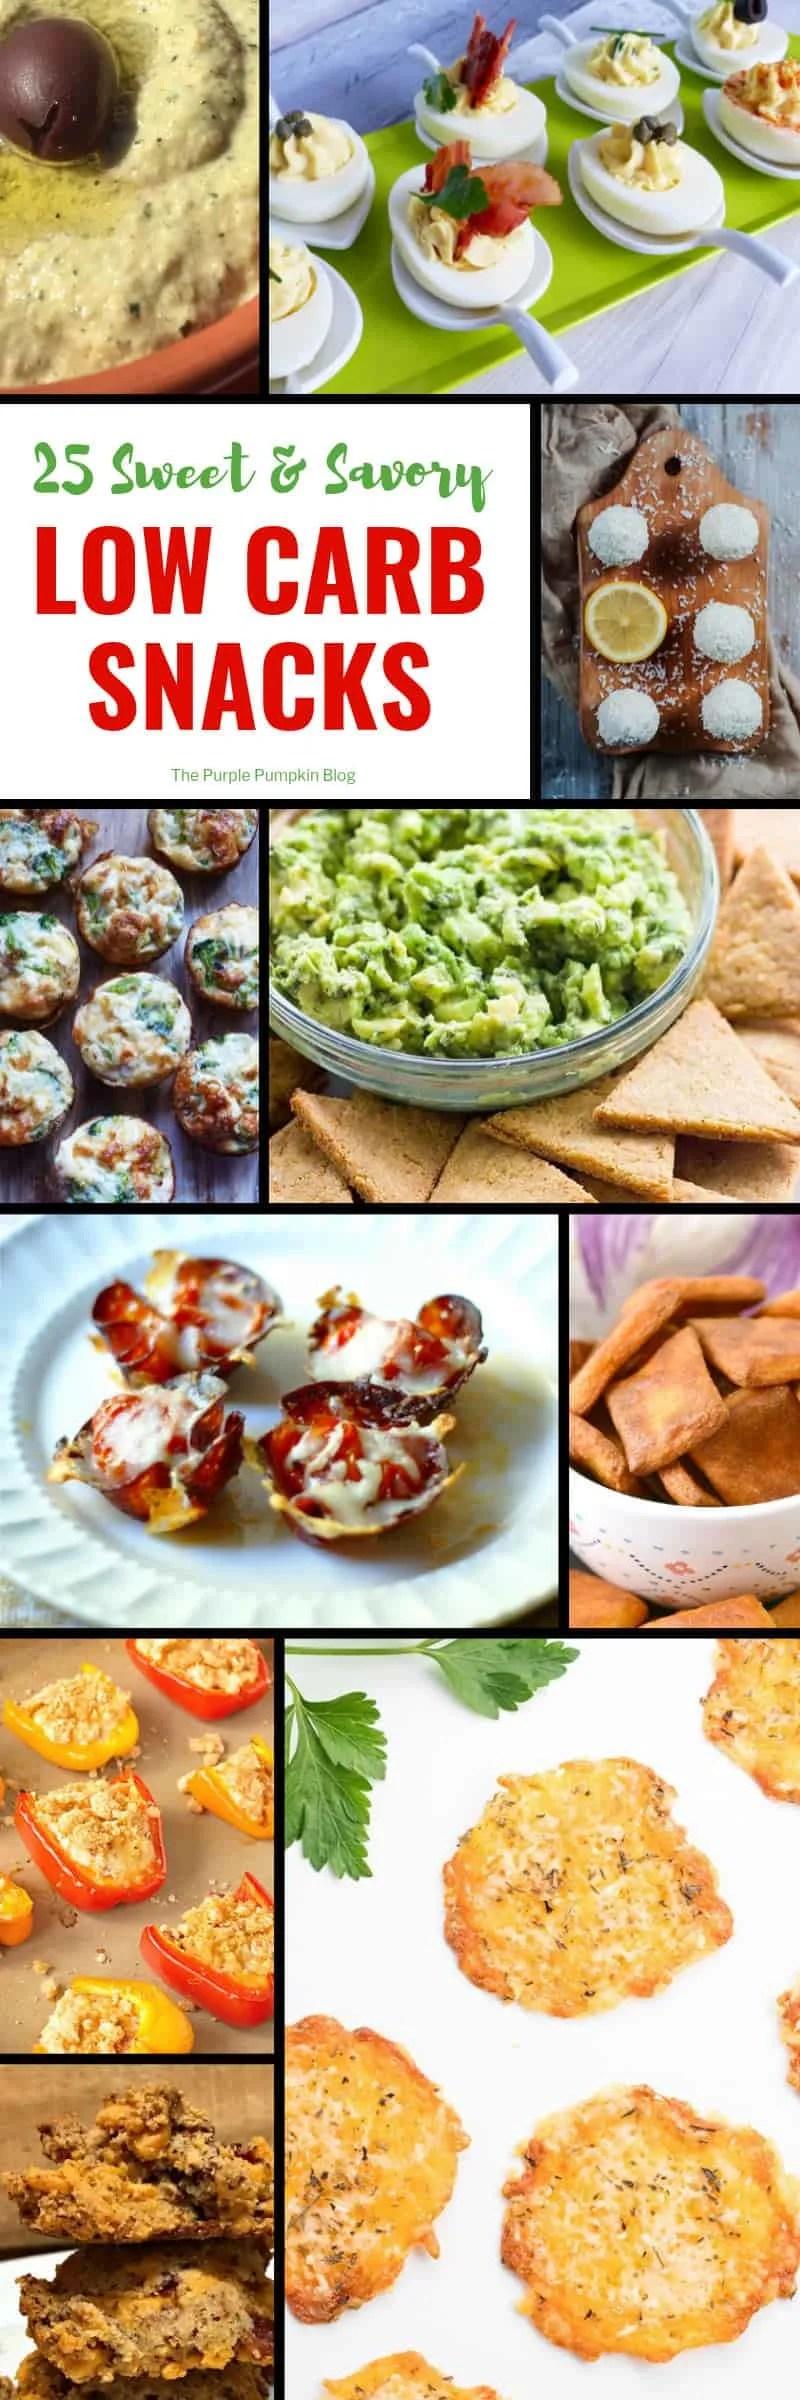 25 Sweet & Savory Low Carb Snacks